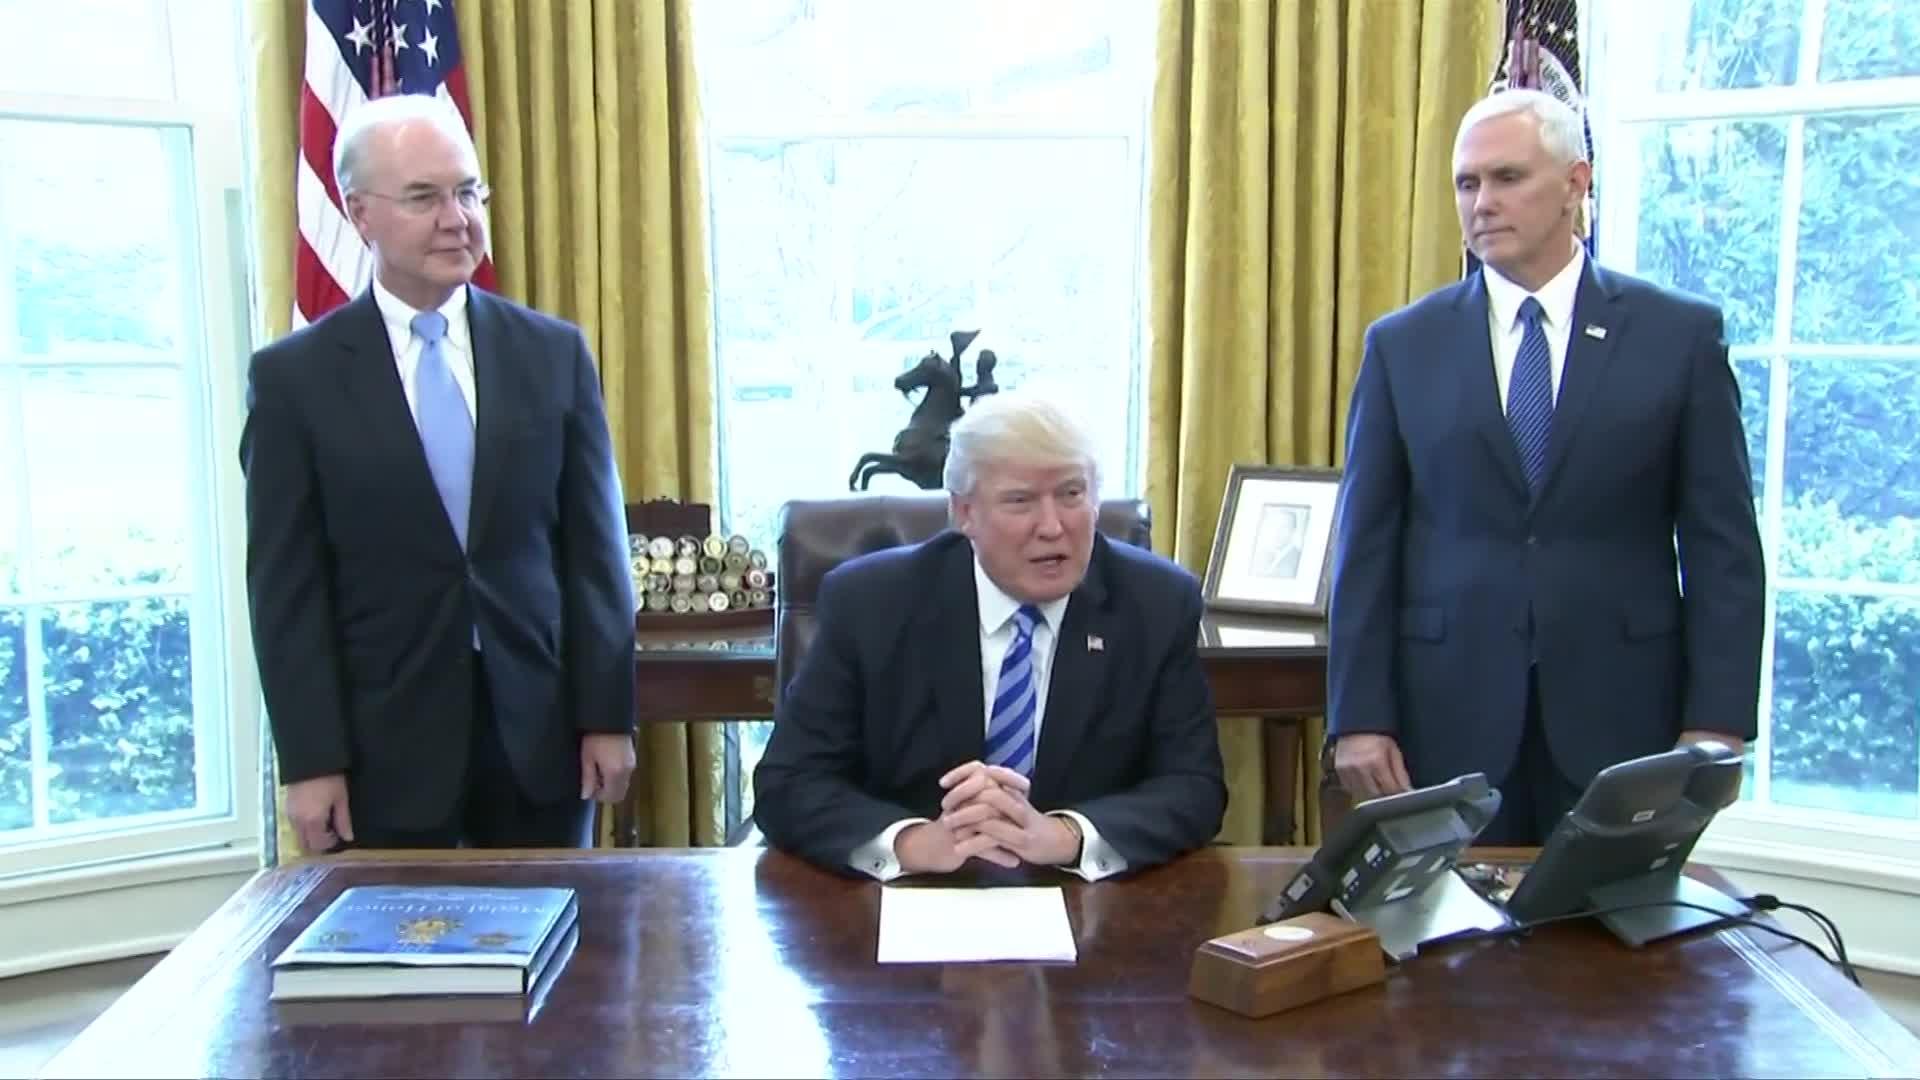 'We were very close': Trump on healthcare bill